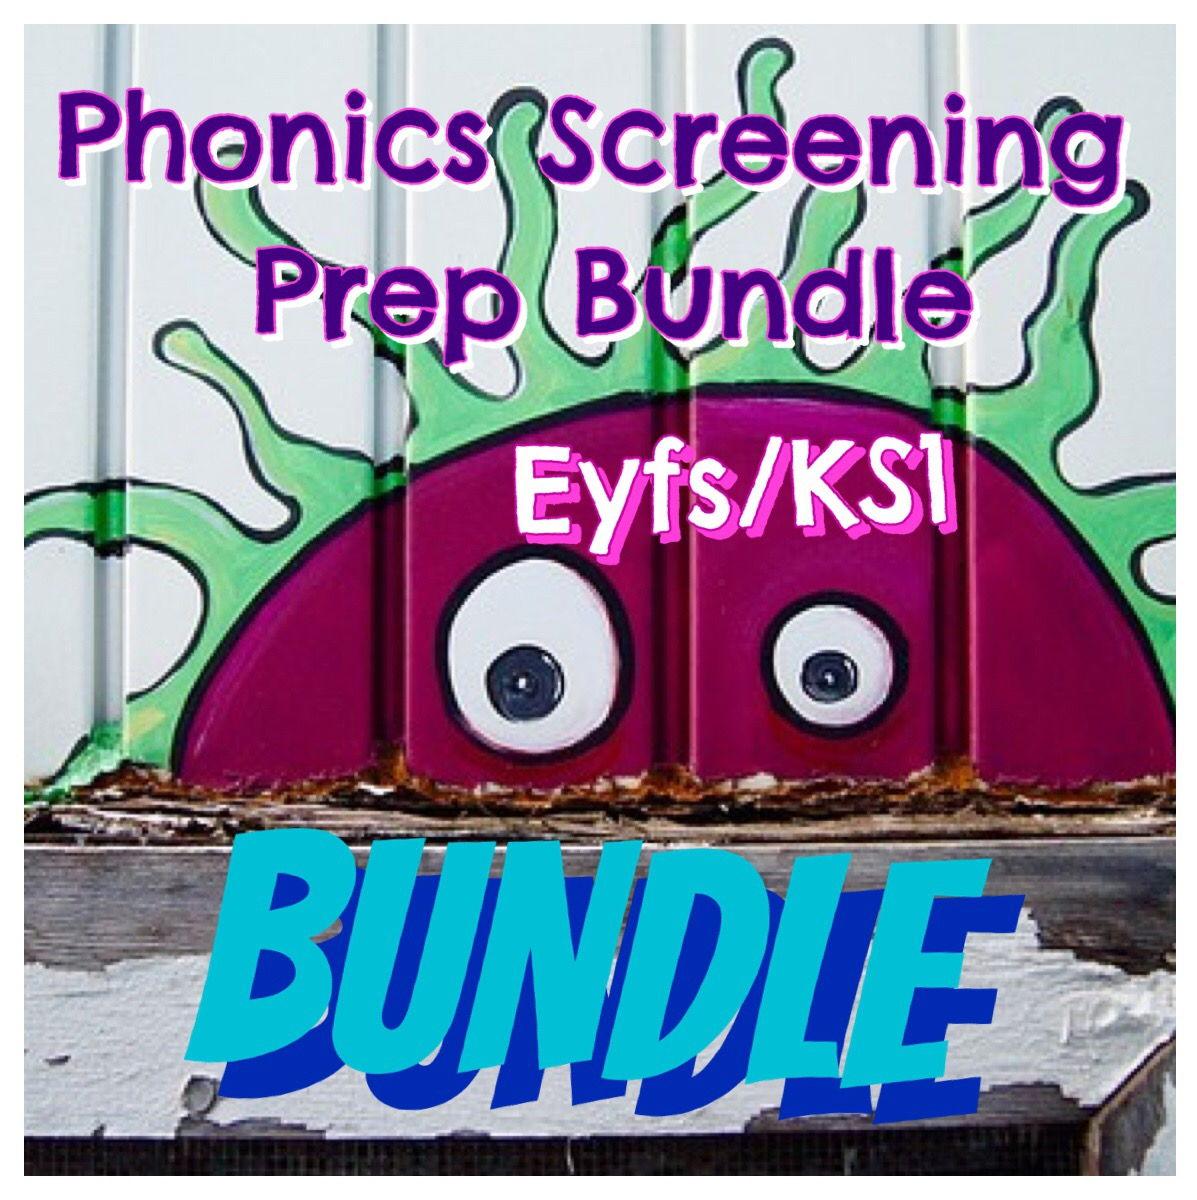 Phonics Screening Prep Bundle